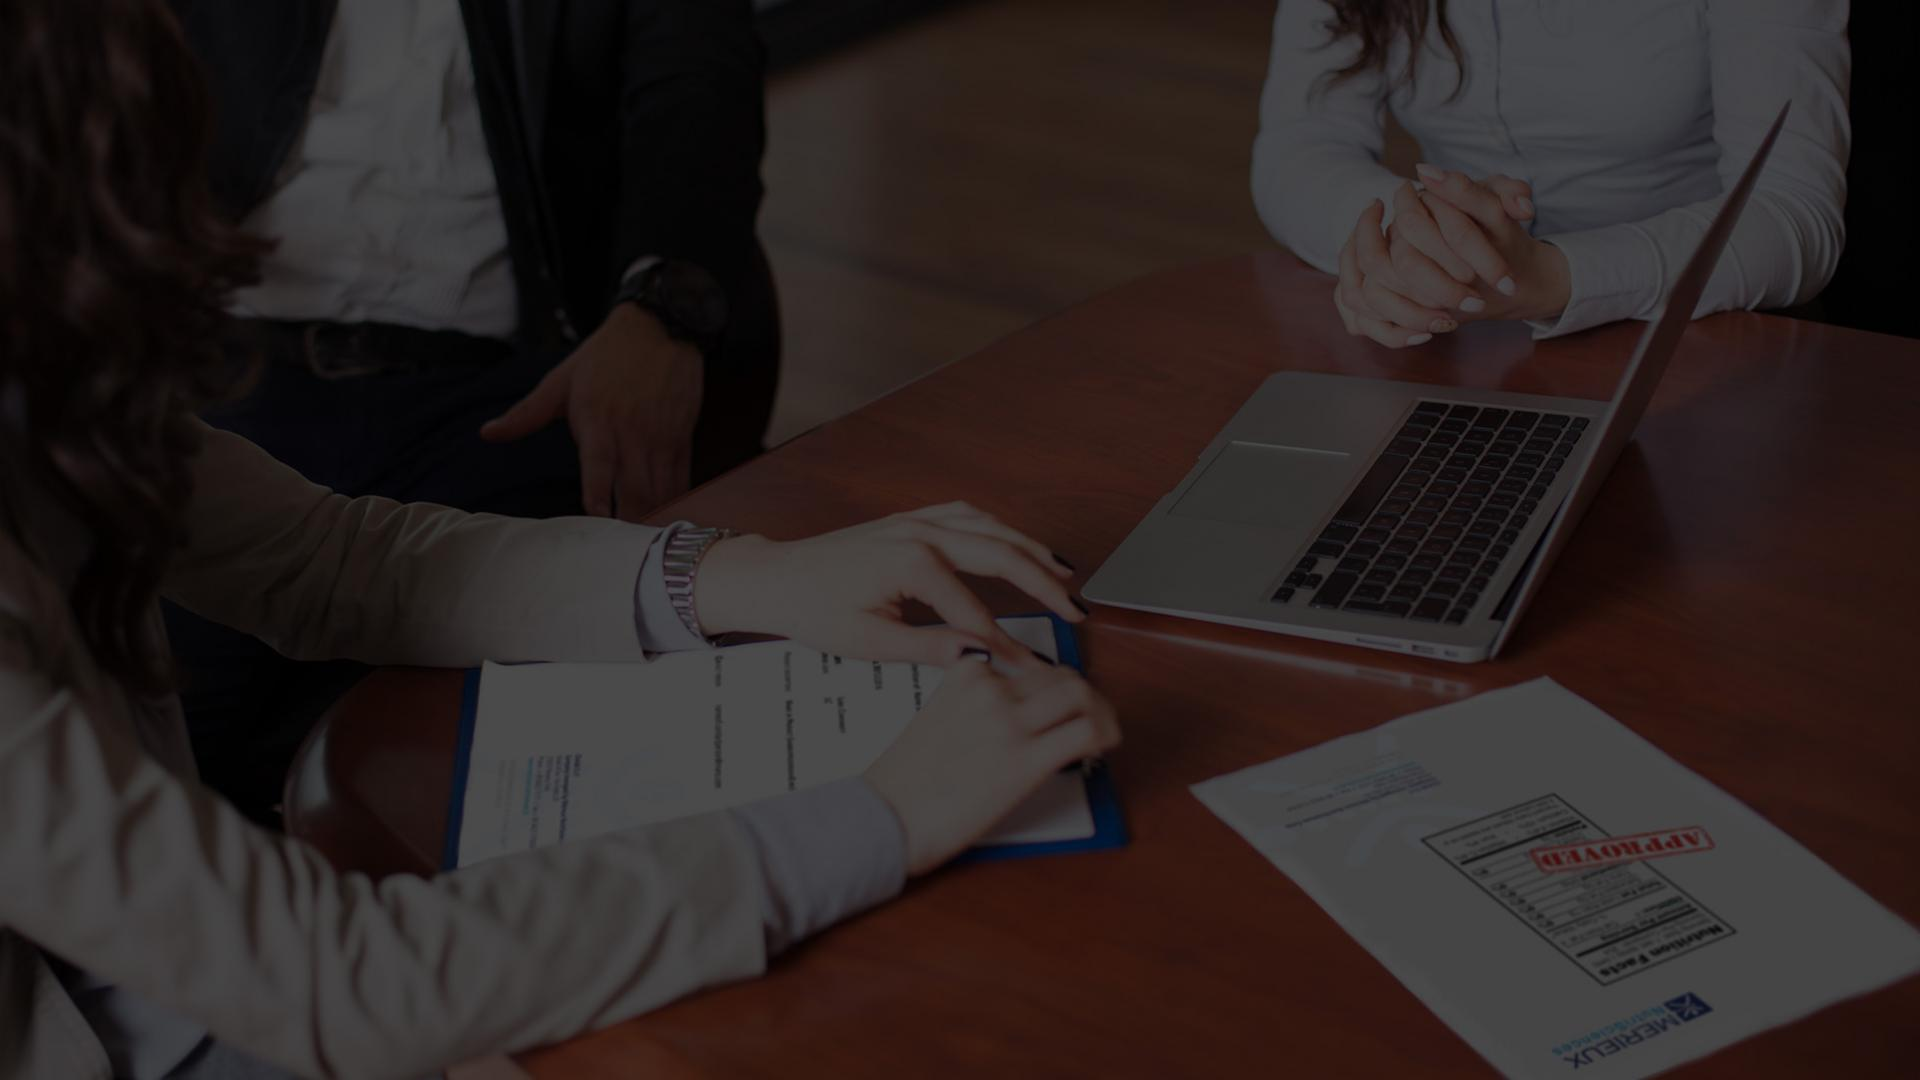 Mérieux NutriSciences_Labeling and regulatory_Regulatory consulting